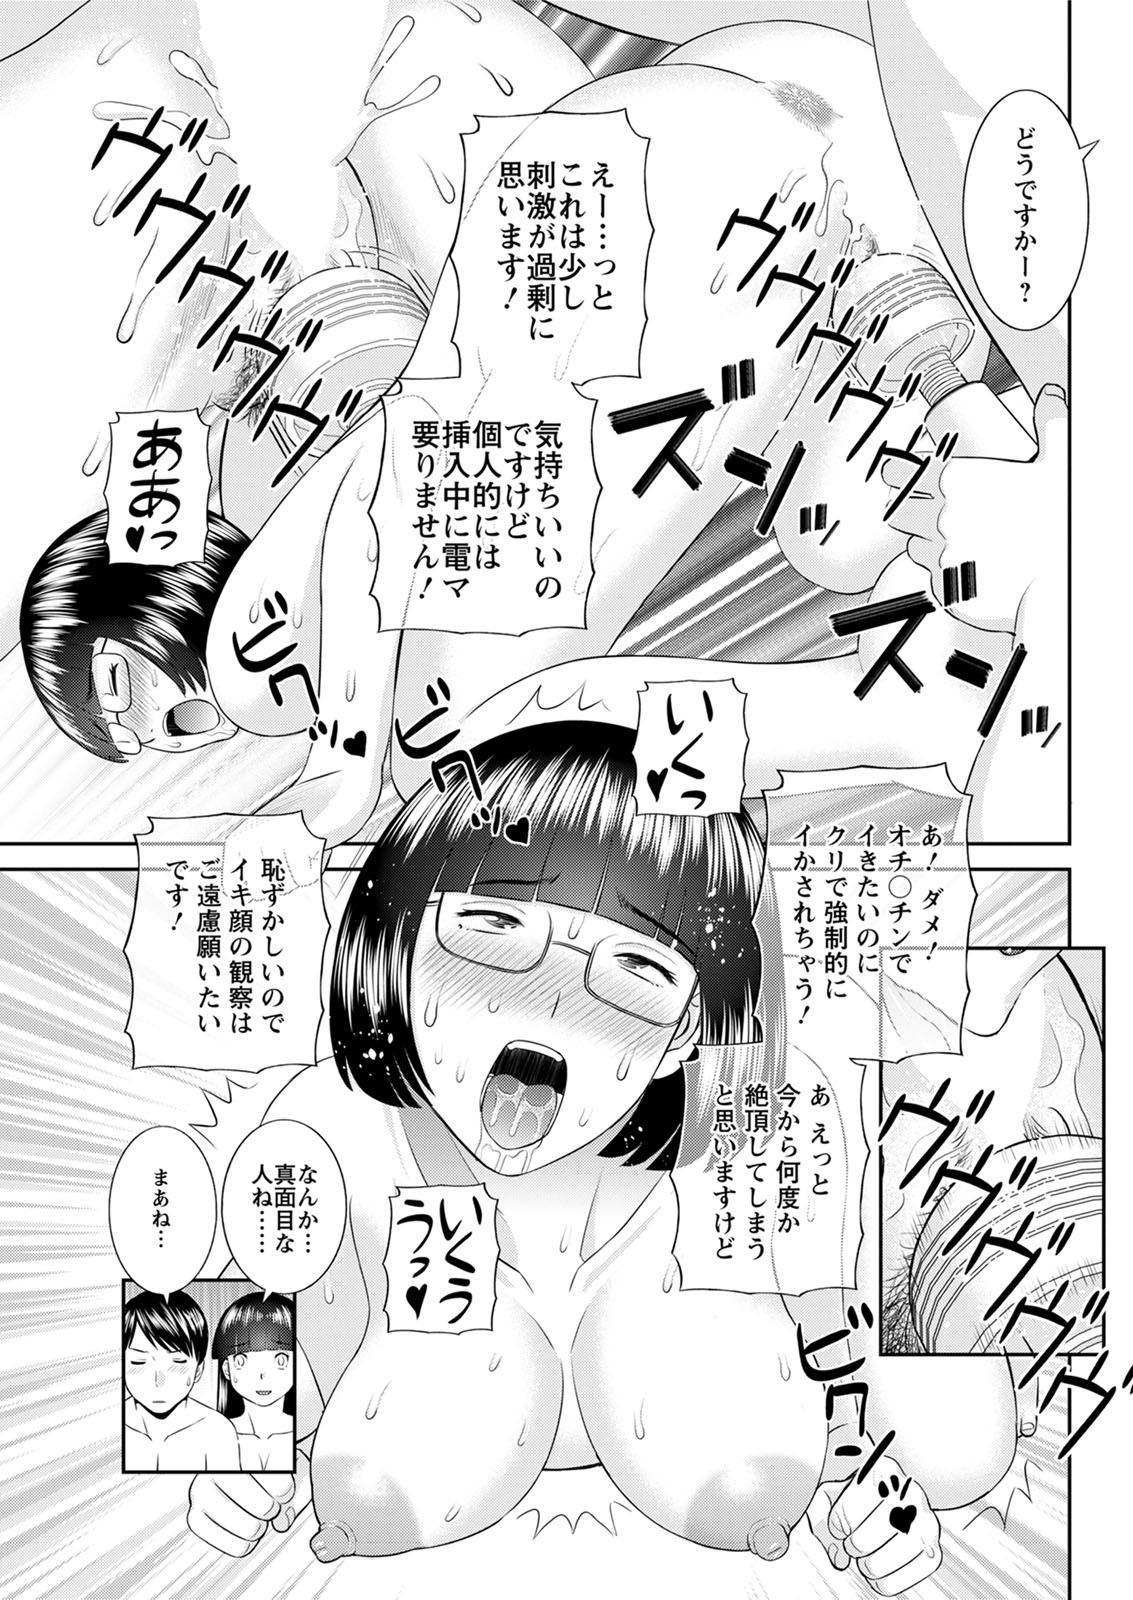 [Kawamori Misaki] Kaikan Hitotsuma Gakuen Ch. 1-6, 8-16 [Digital] 273